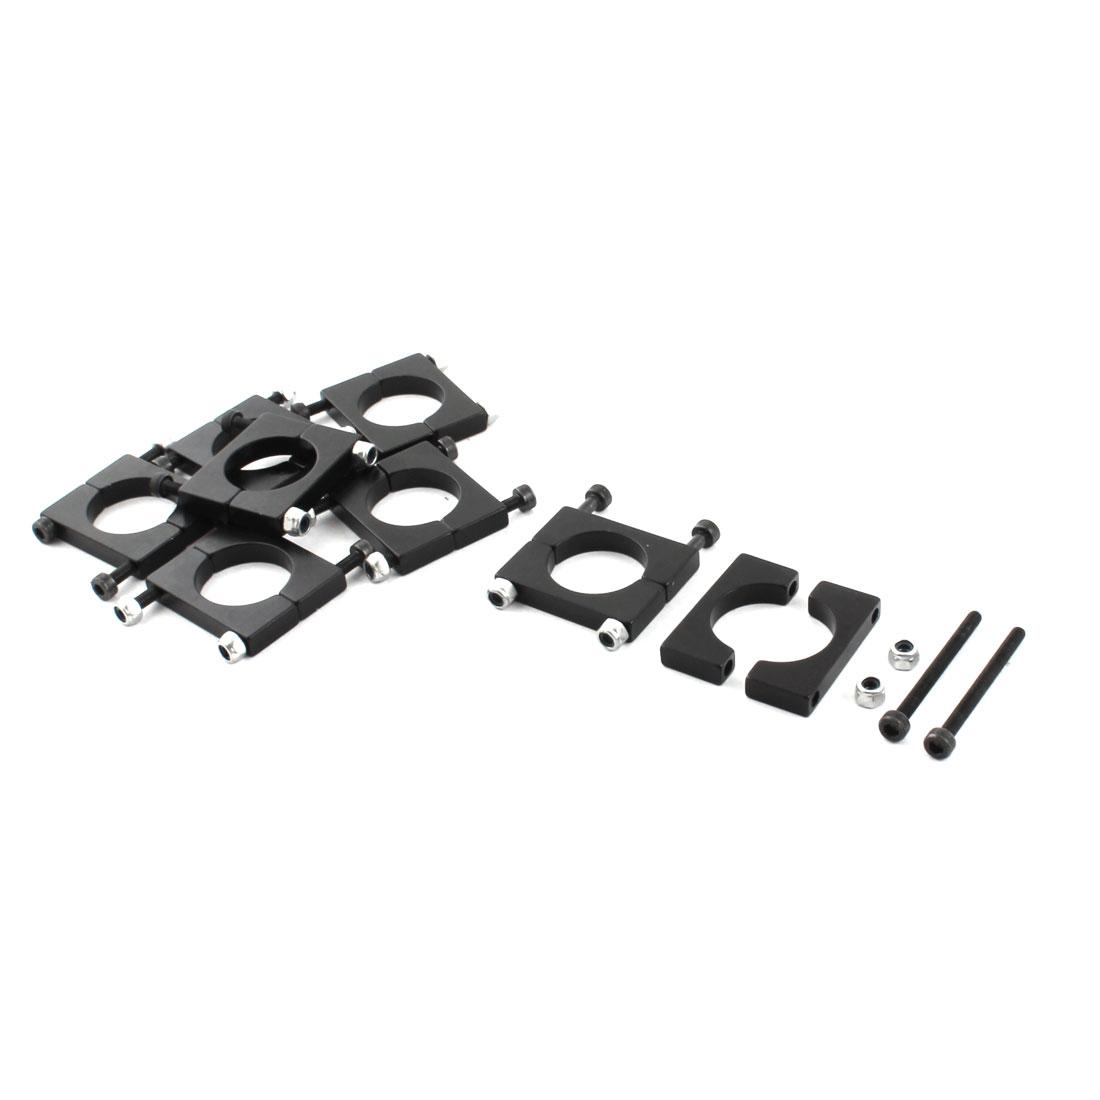 8Pcs 16mm Black Aluminum Clamp for Carbon Fiber Tube RC Quadcopter Hexrcopter